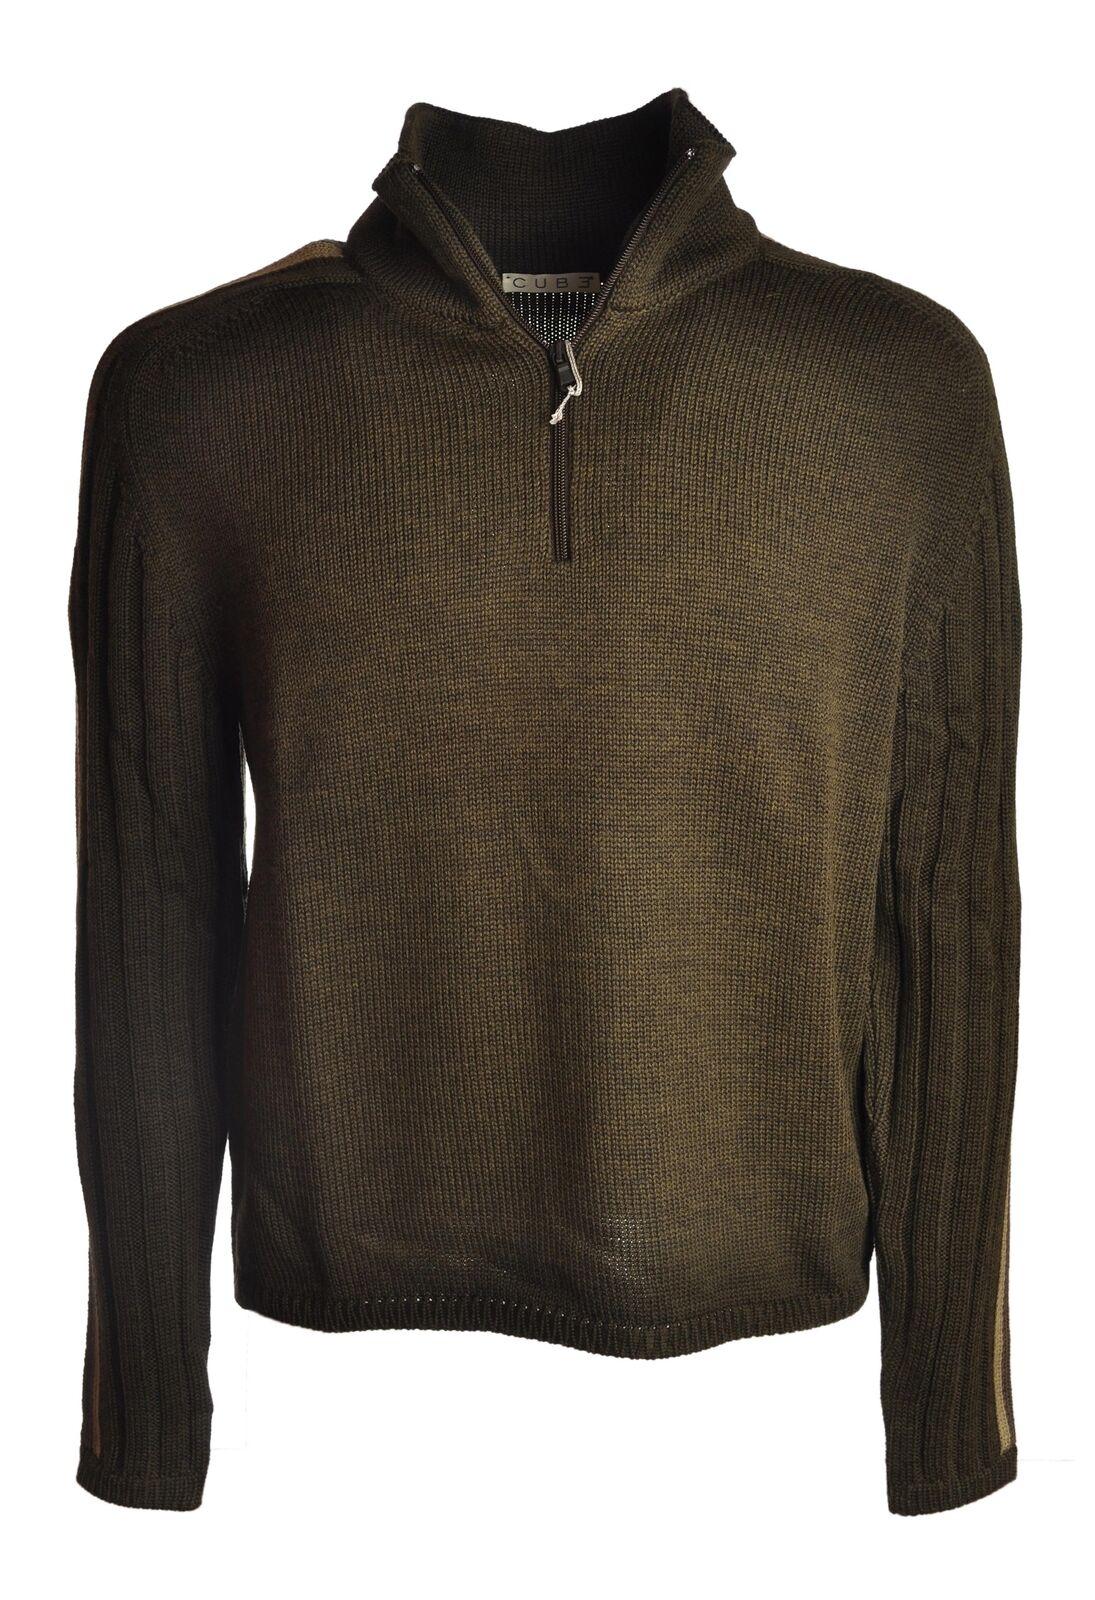 Cube  -  Sweaters - Male - Green - 4366811L173305